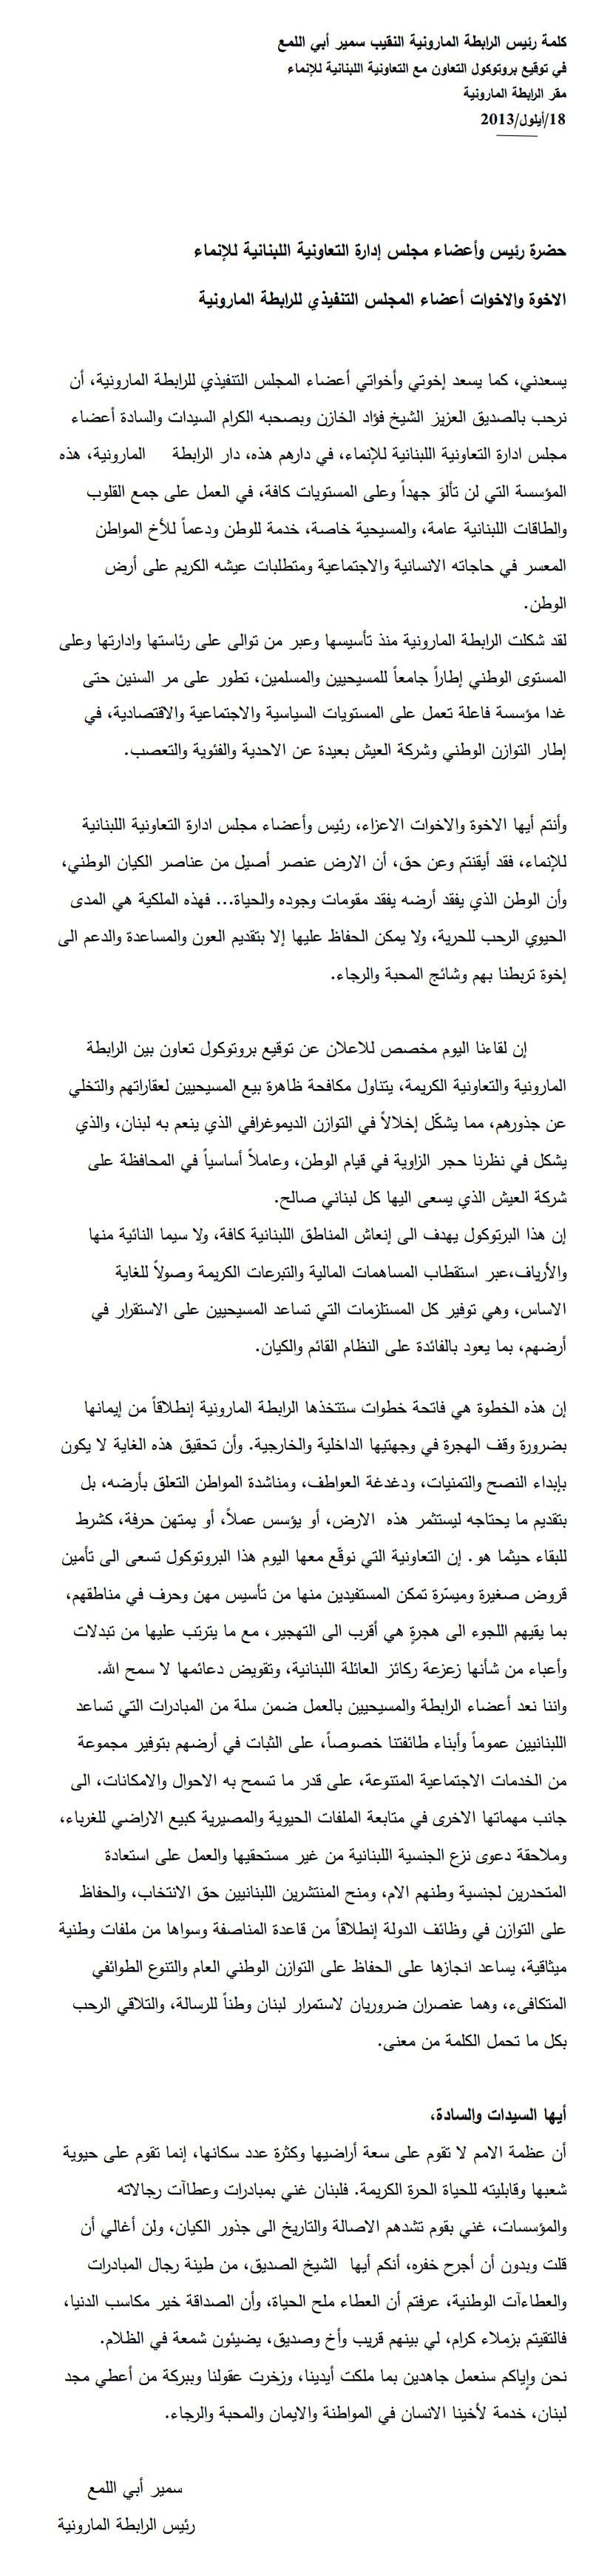 speech samir abi lamaa